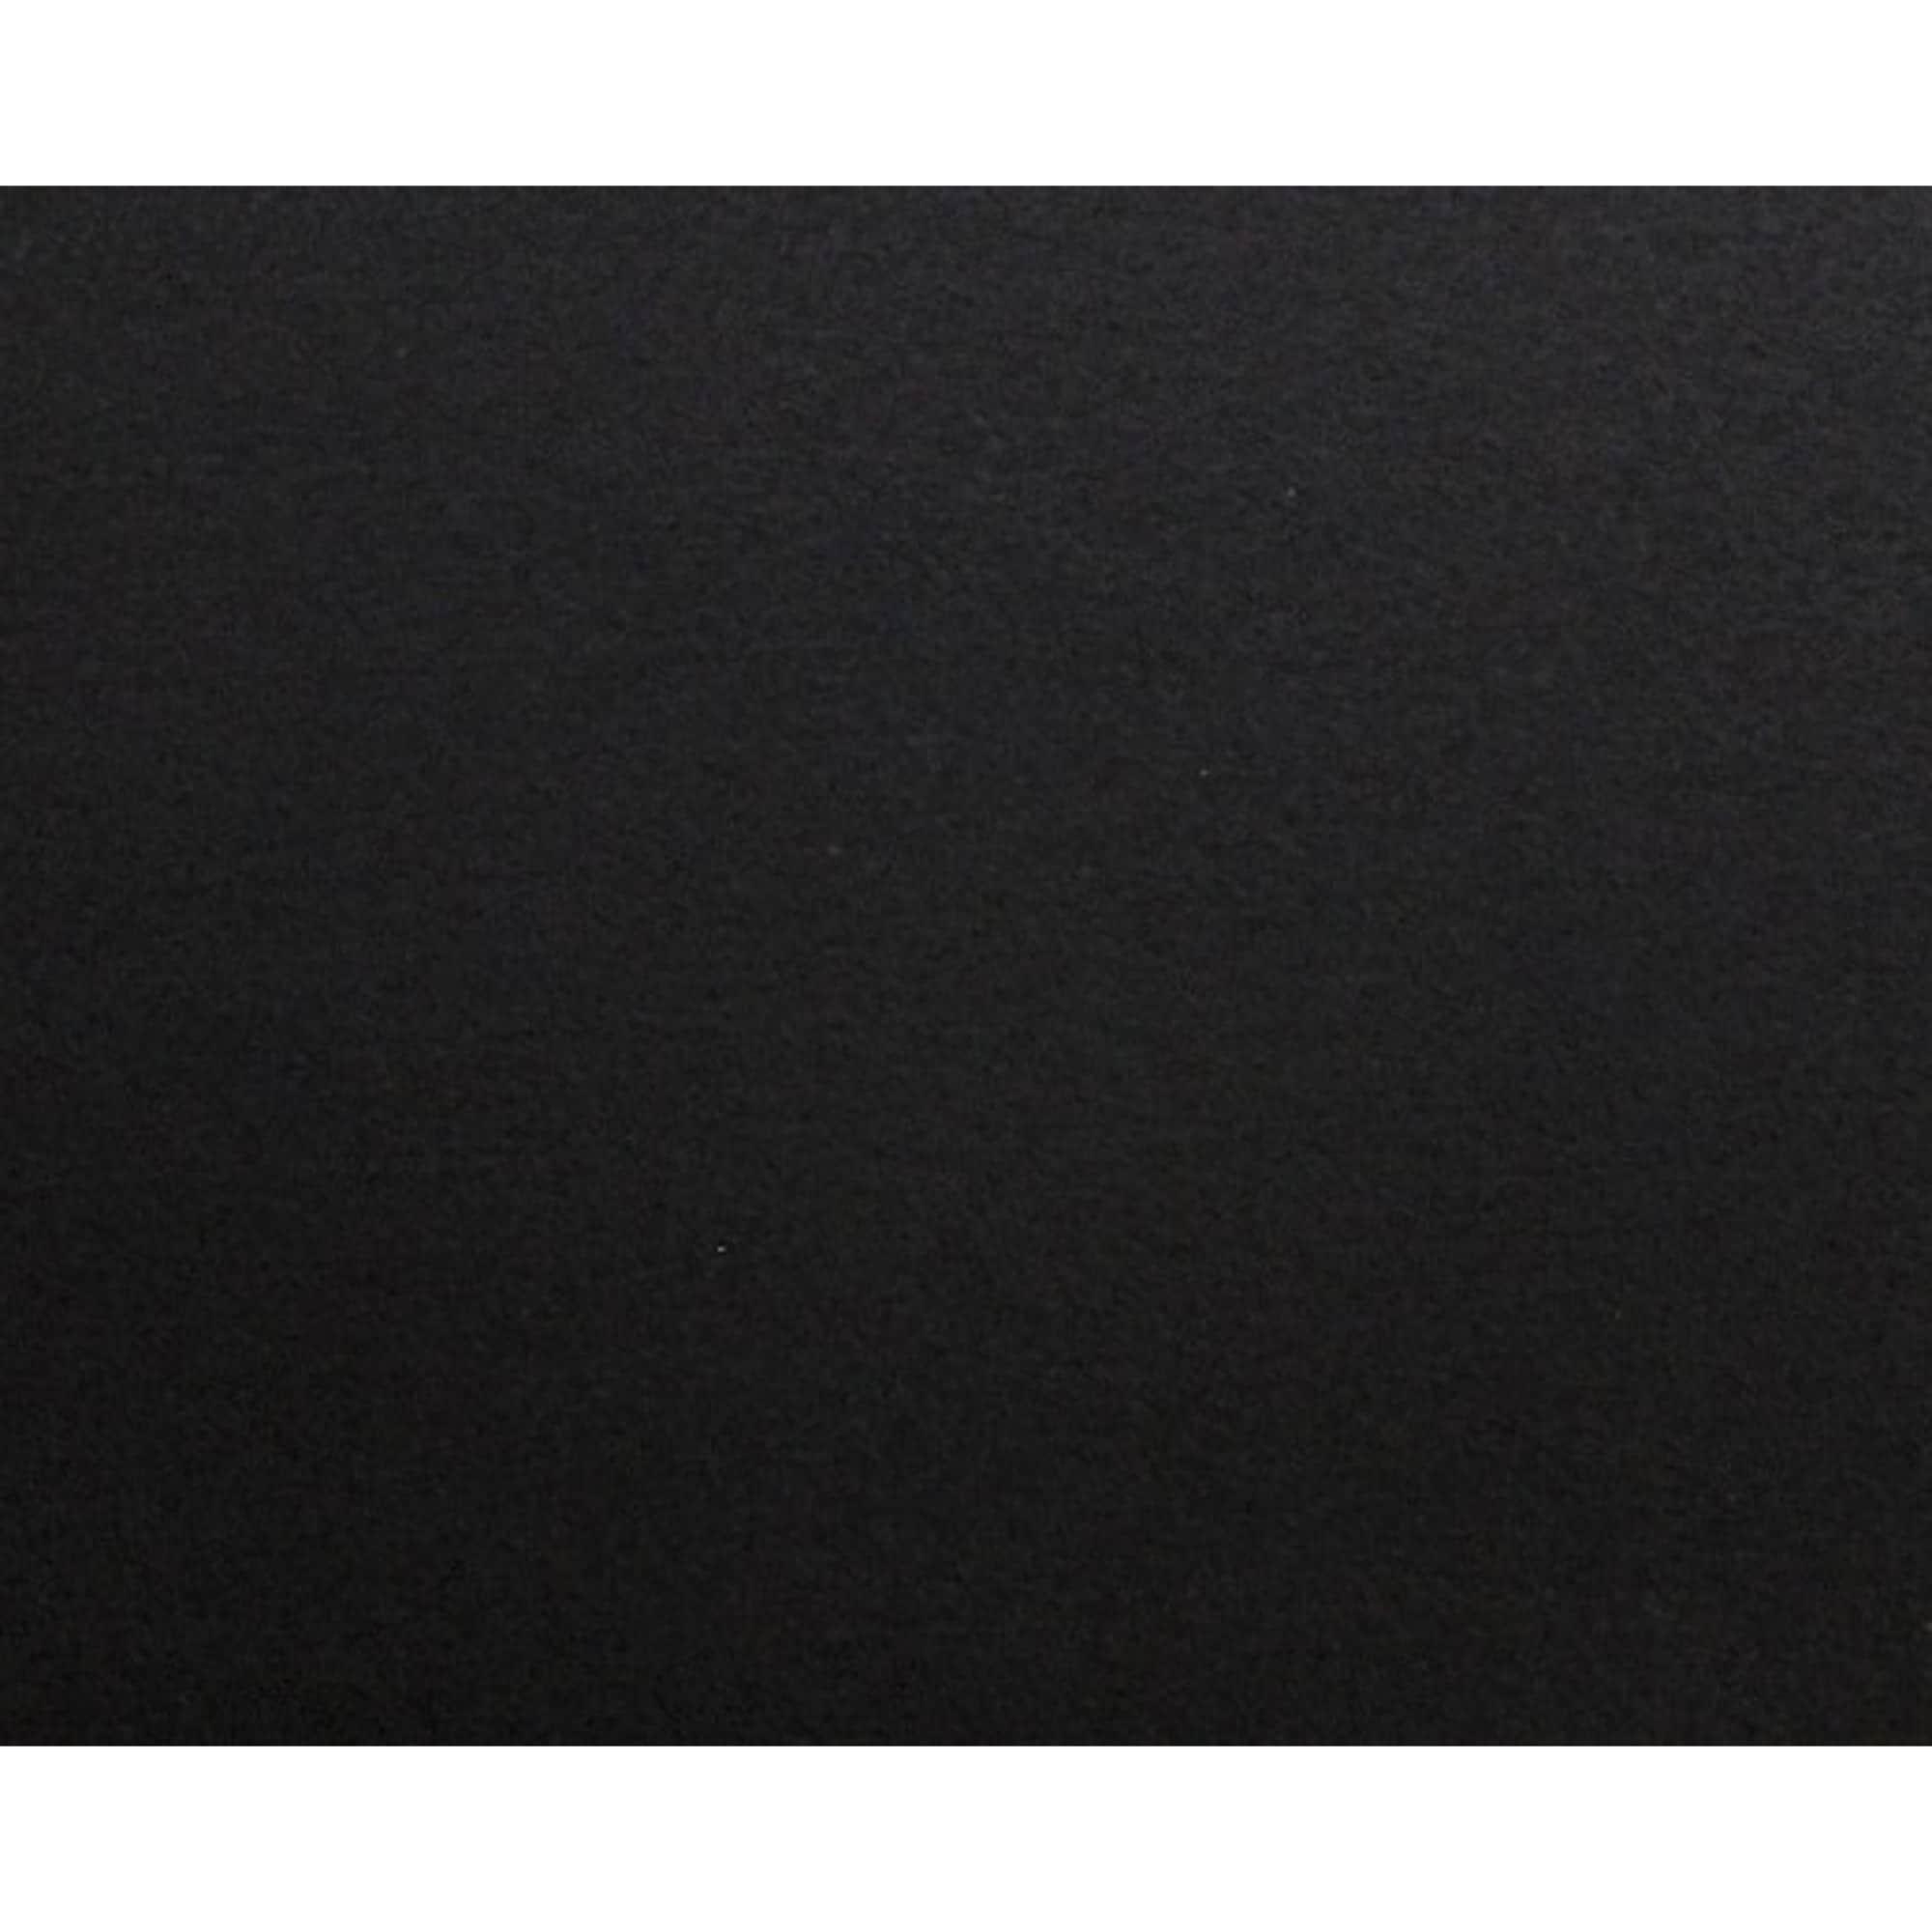 Mats Inc EZ Flex//iFlex Fitness /& Recreational Flooring 4 x 6 Black//Blue